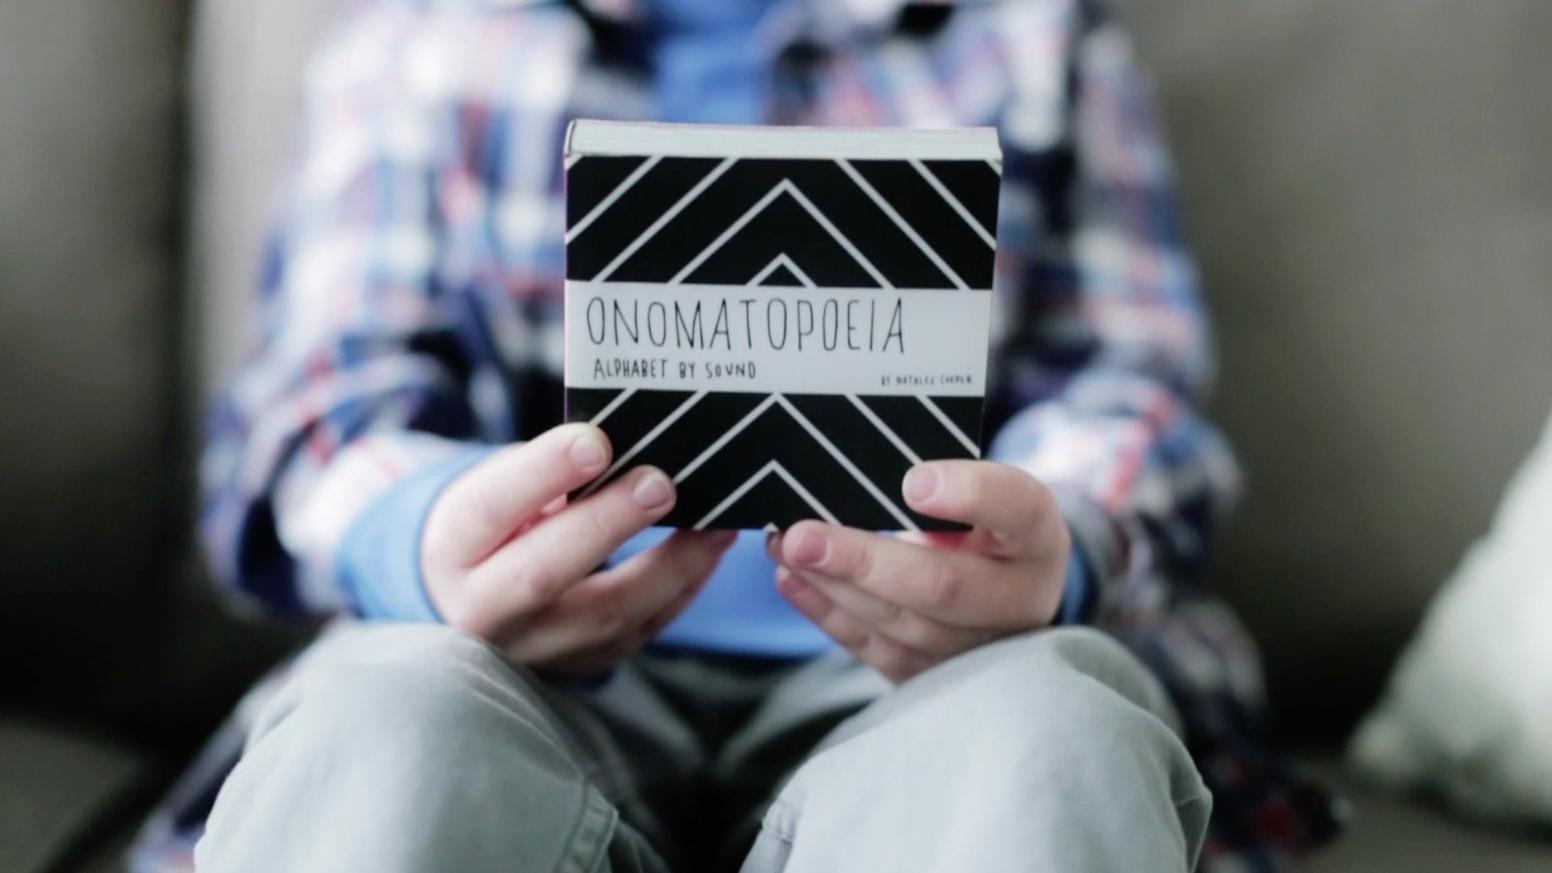 Onomatopoeia an Alphabet Book by Sound by Natalee — Kickstarter